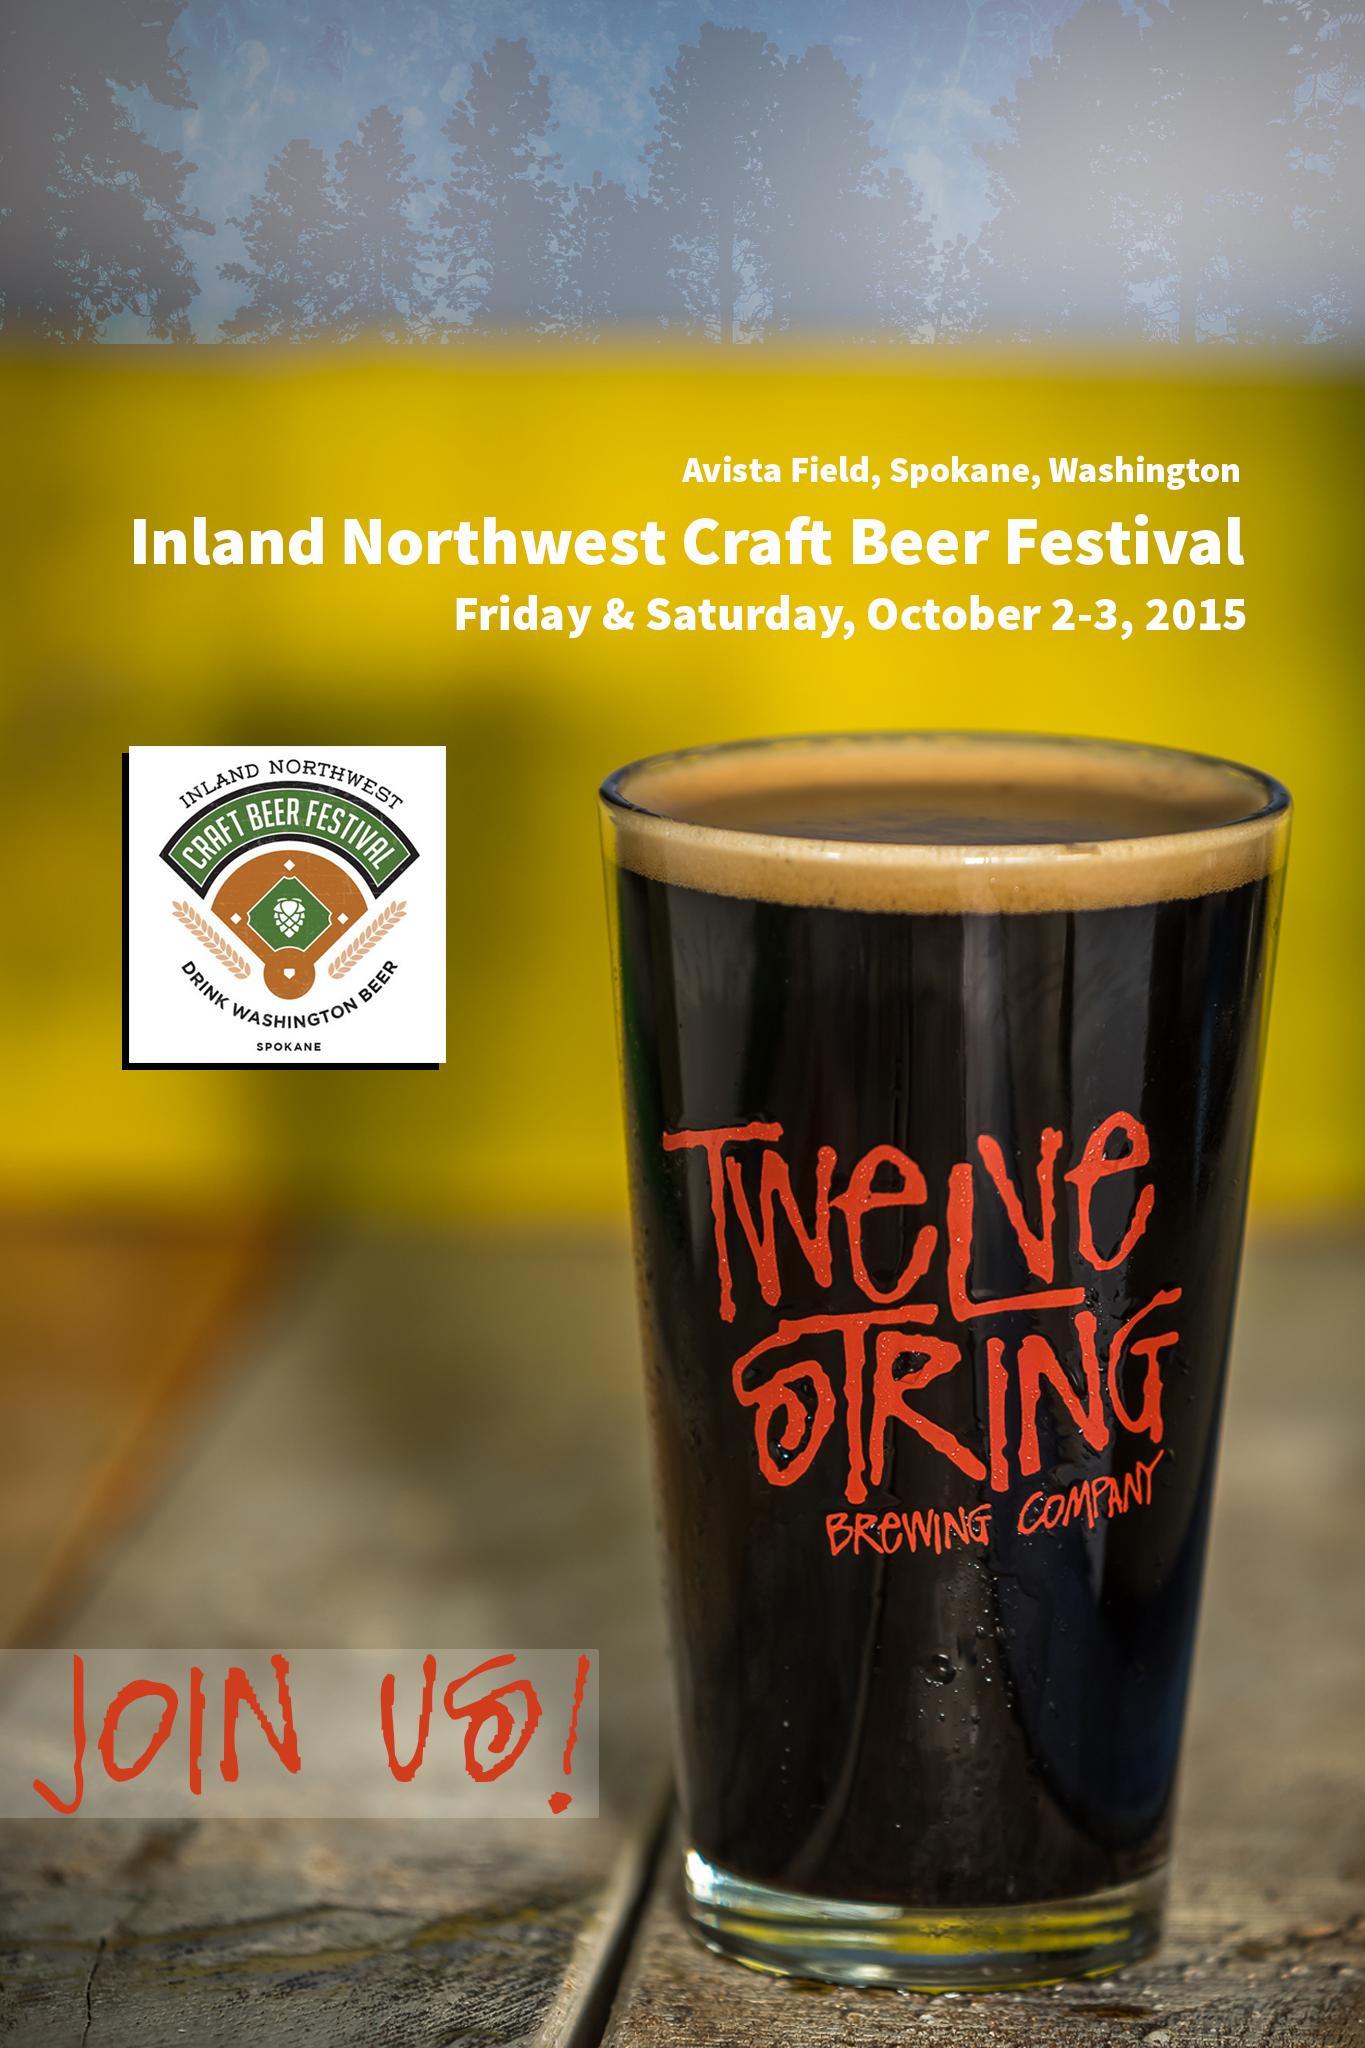 Twelve String Brewing Company, Spokane Valley, WA